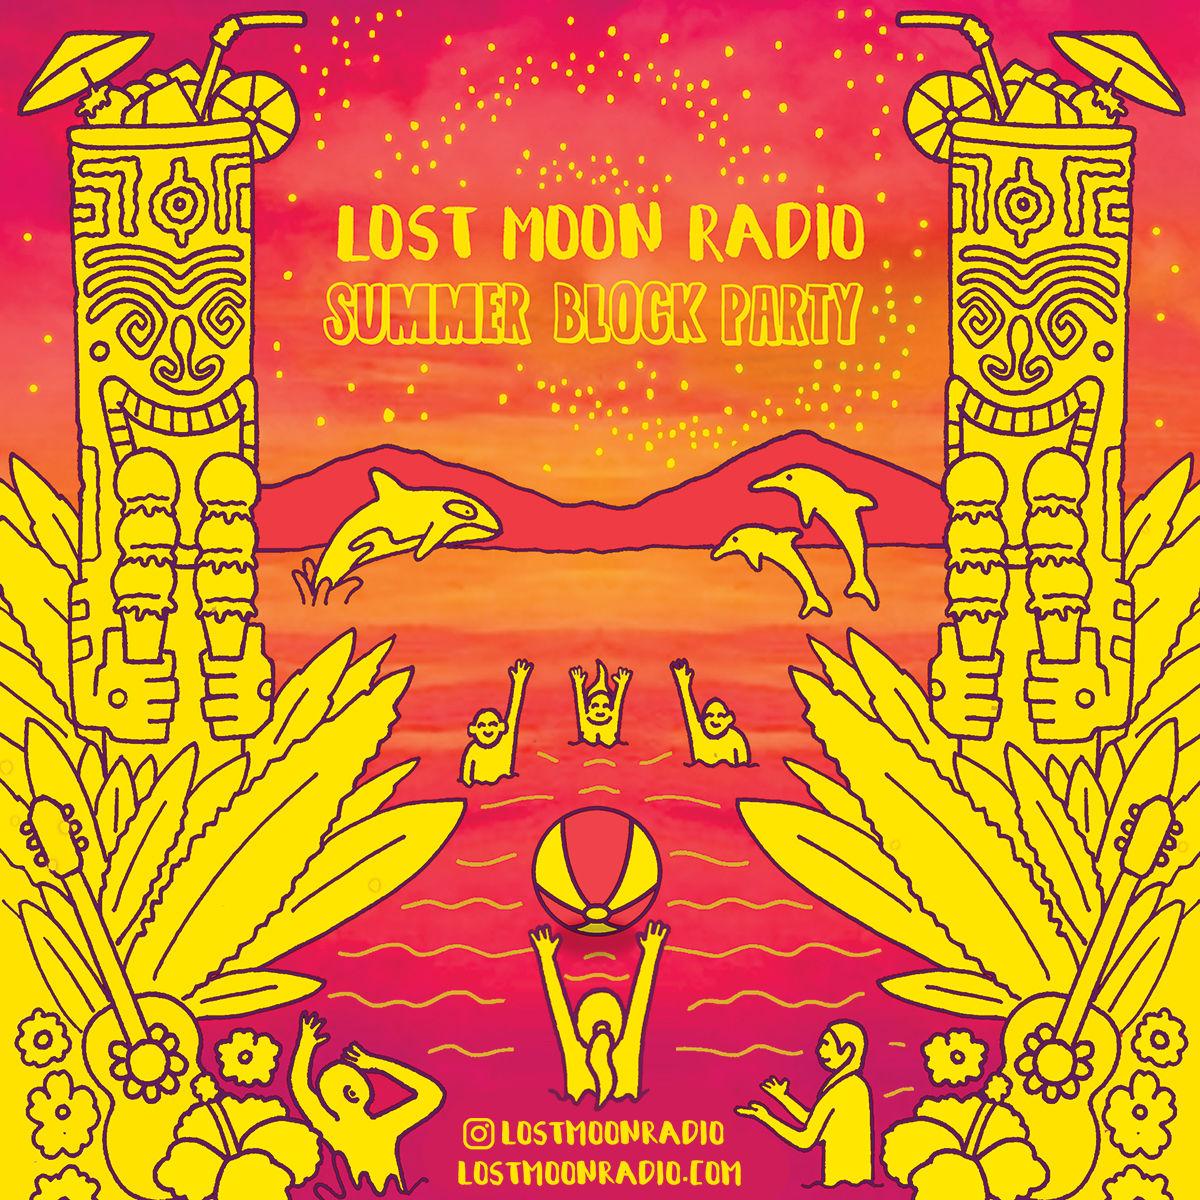 Lost Moon Radio Summer Block Party image 1